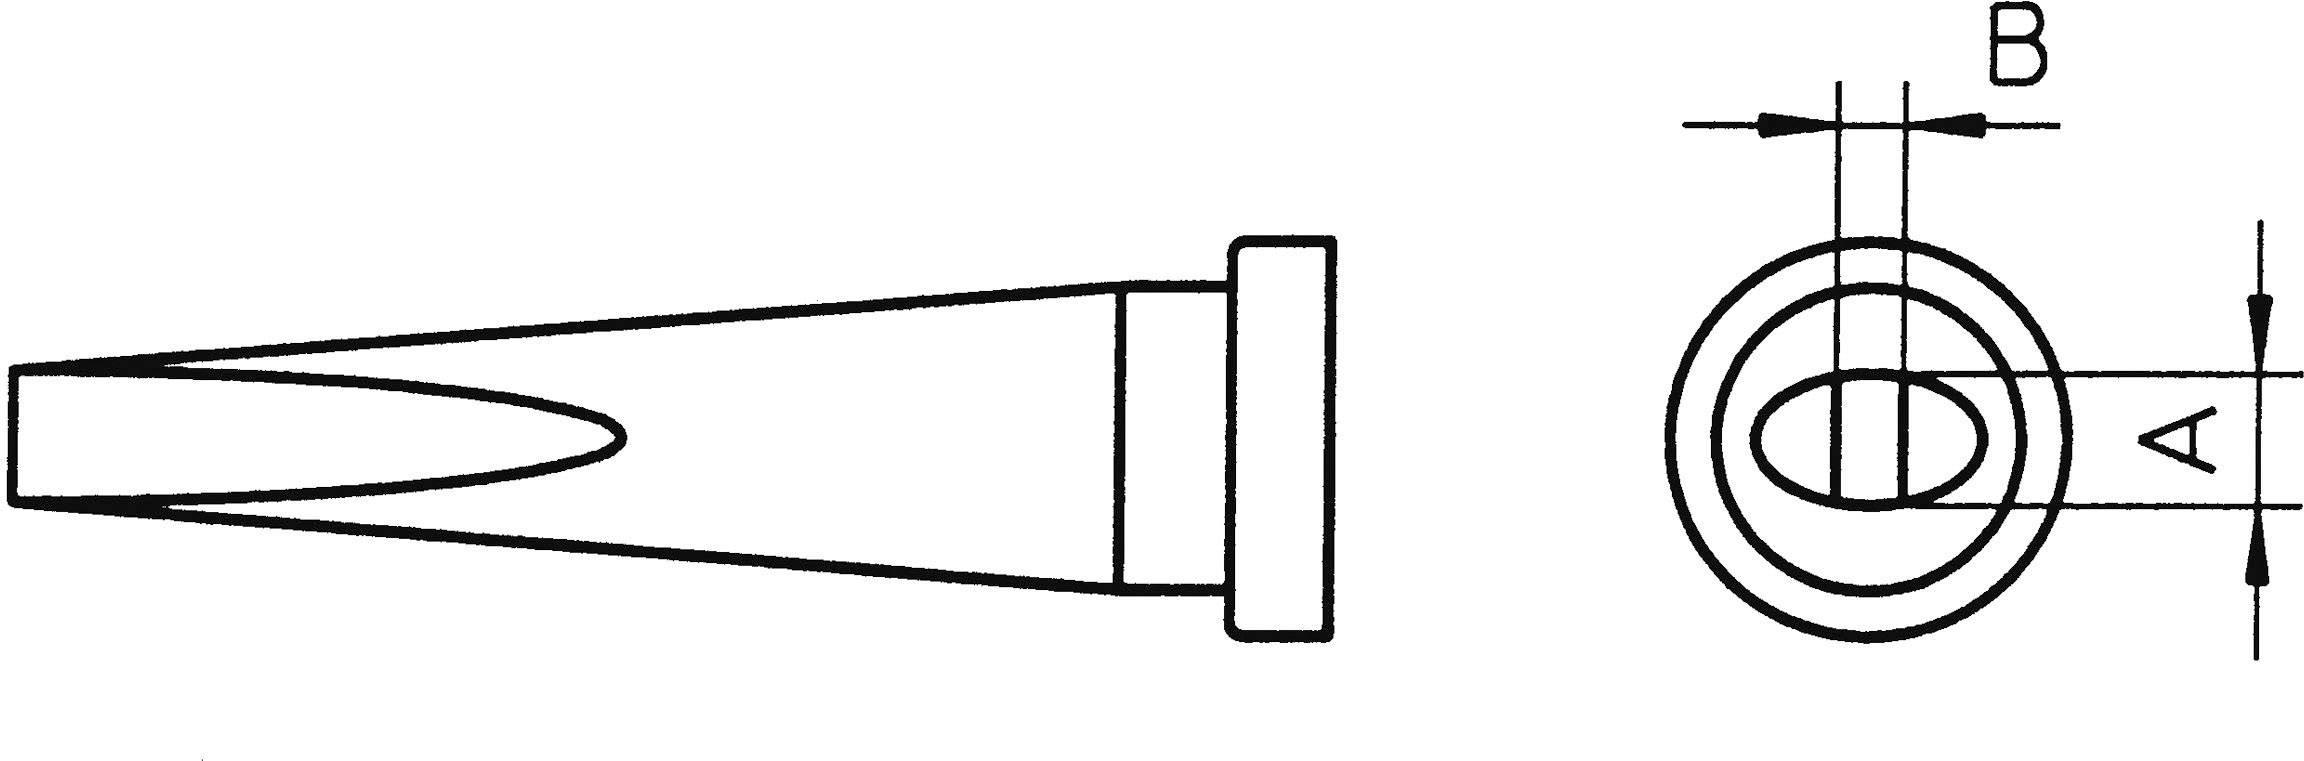 Spájkovací hrot dlátová forma, dlhá Weller Professional LT-L, velikost hrotu 2 mm, 1 ks